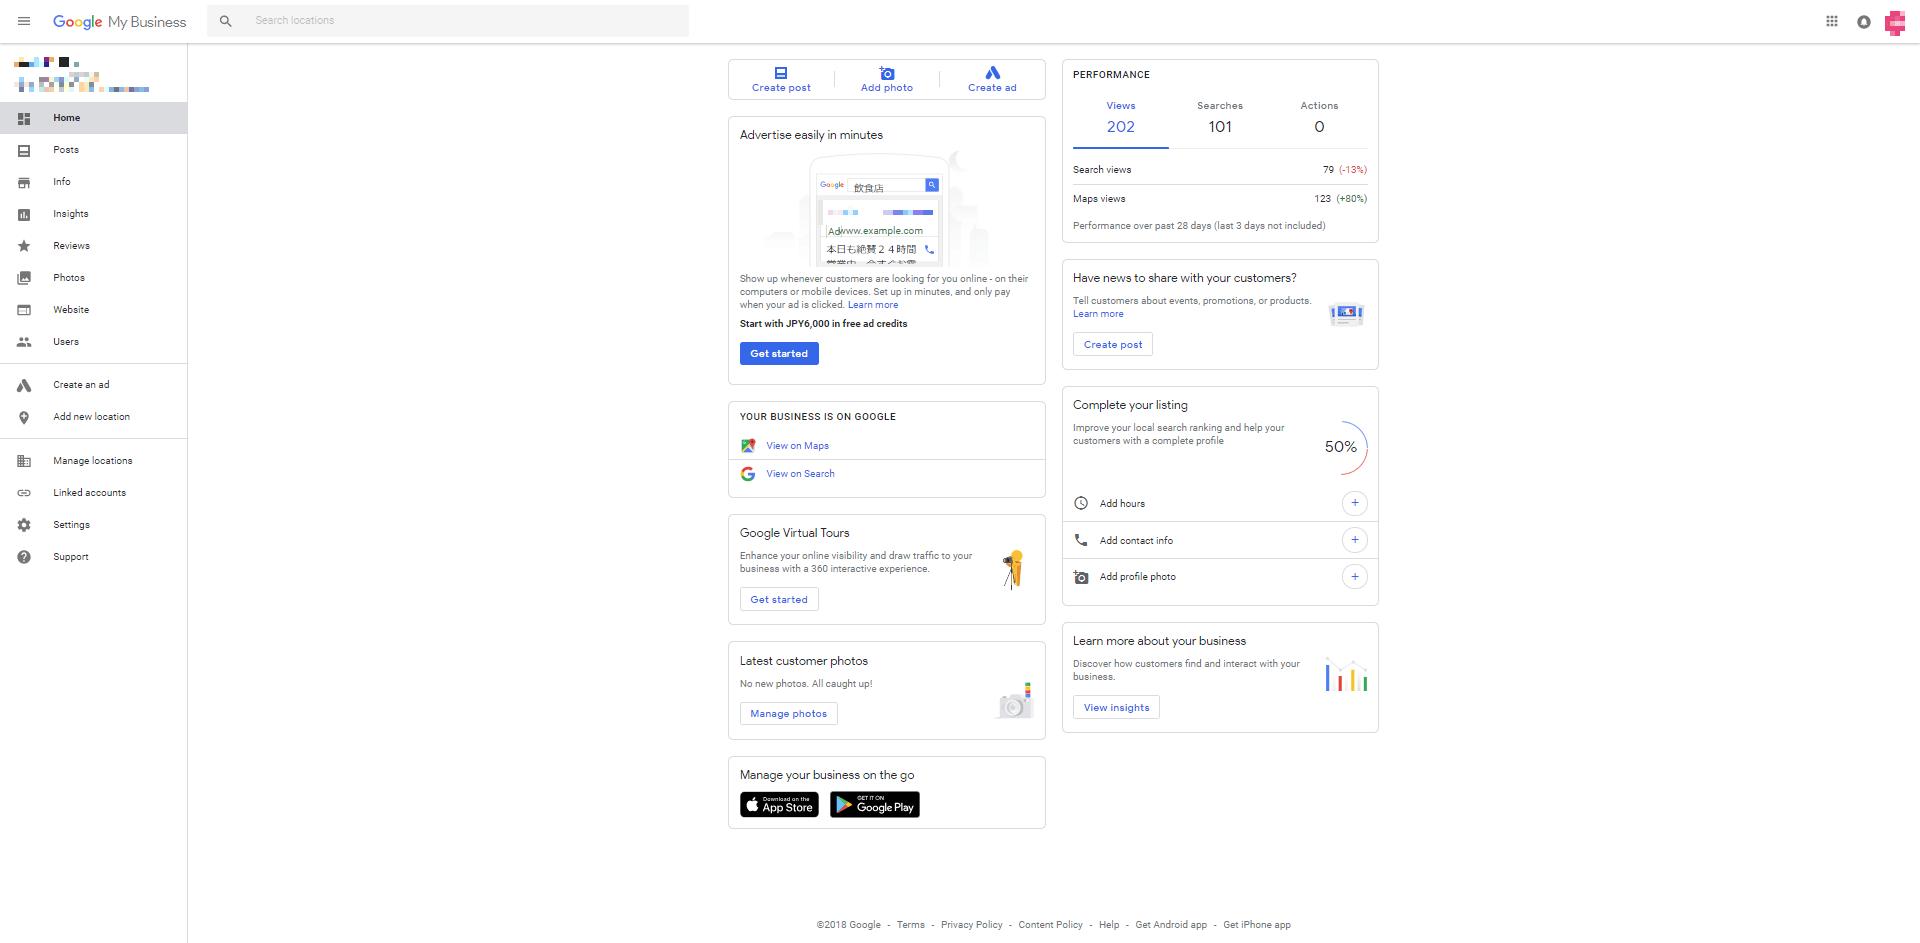 Googleマイビジネスの管理画面が英語に